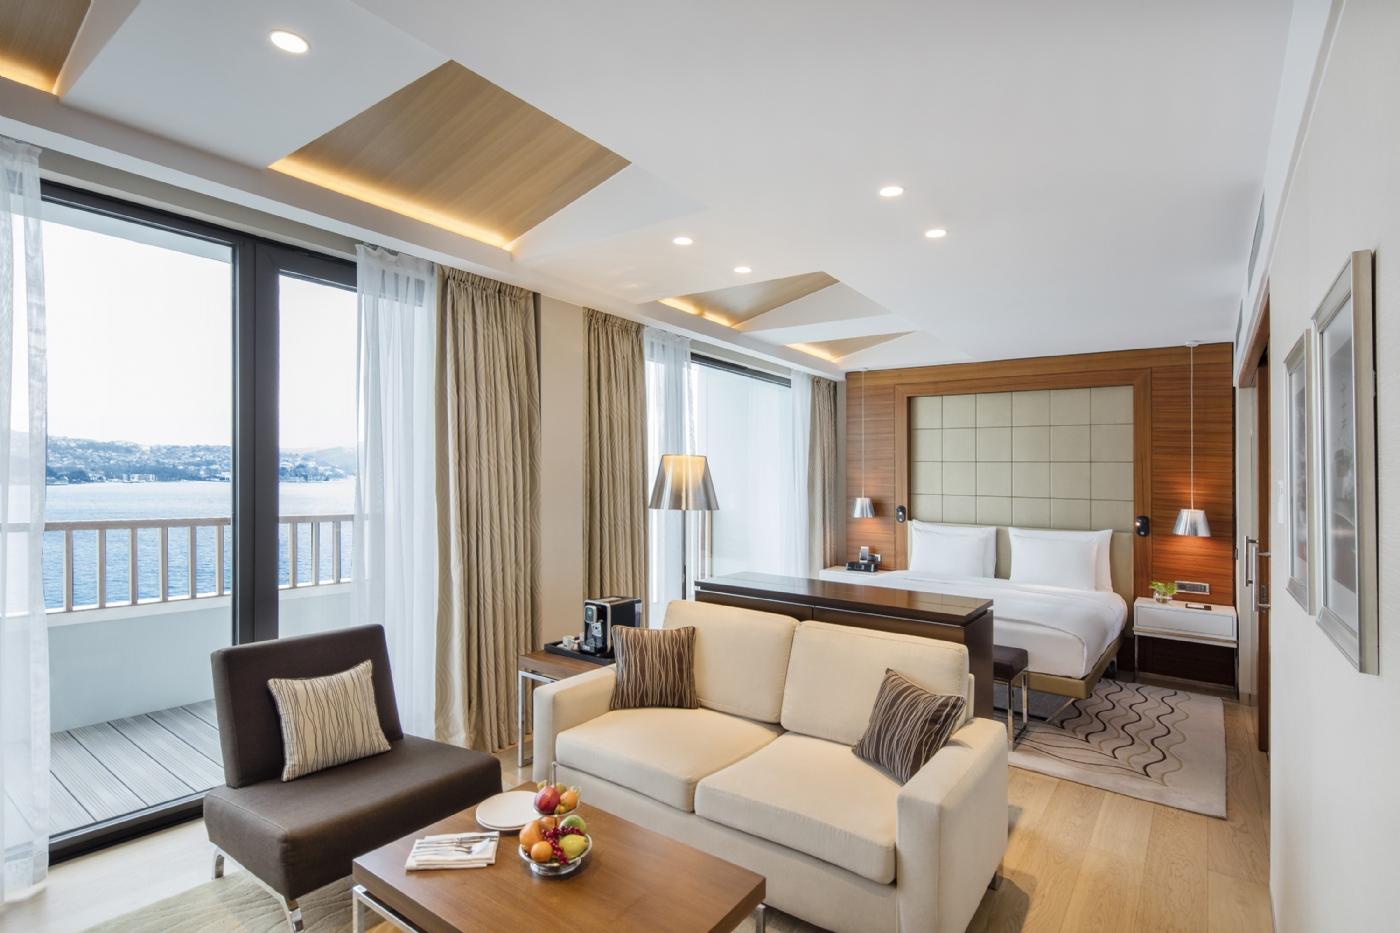 هتل گرند تارابایا استانبول